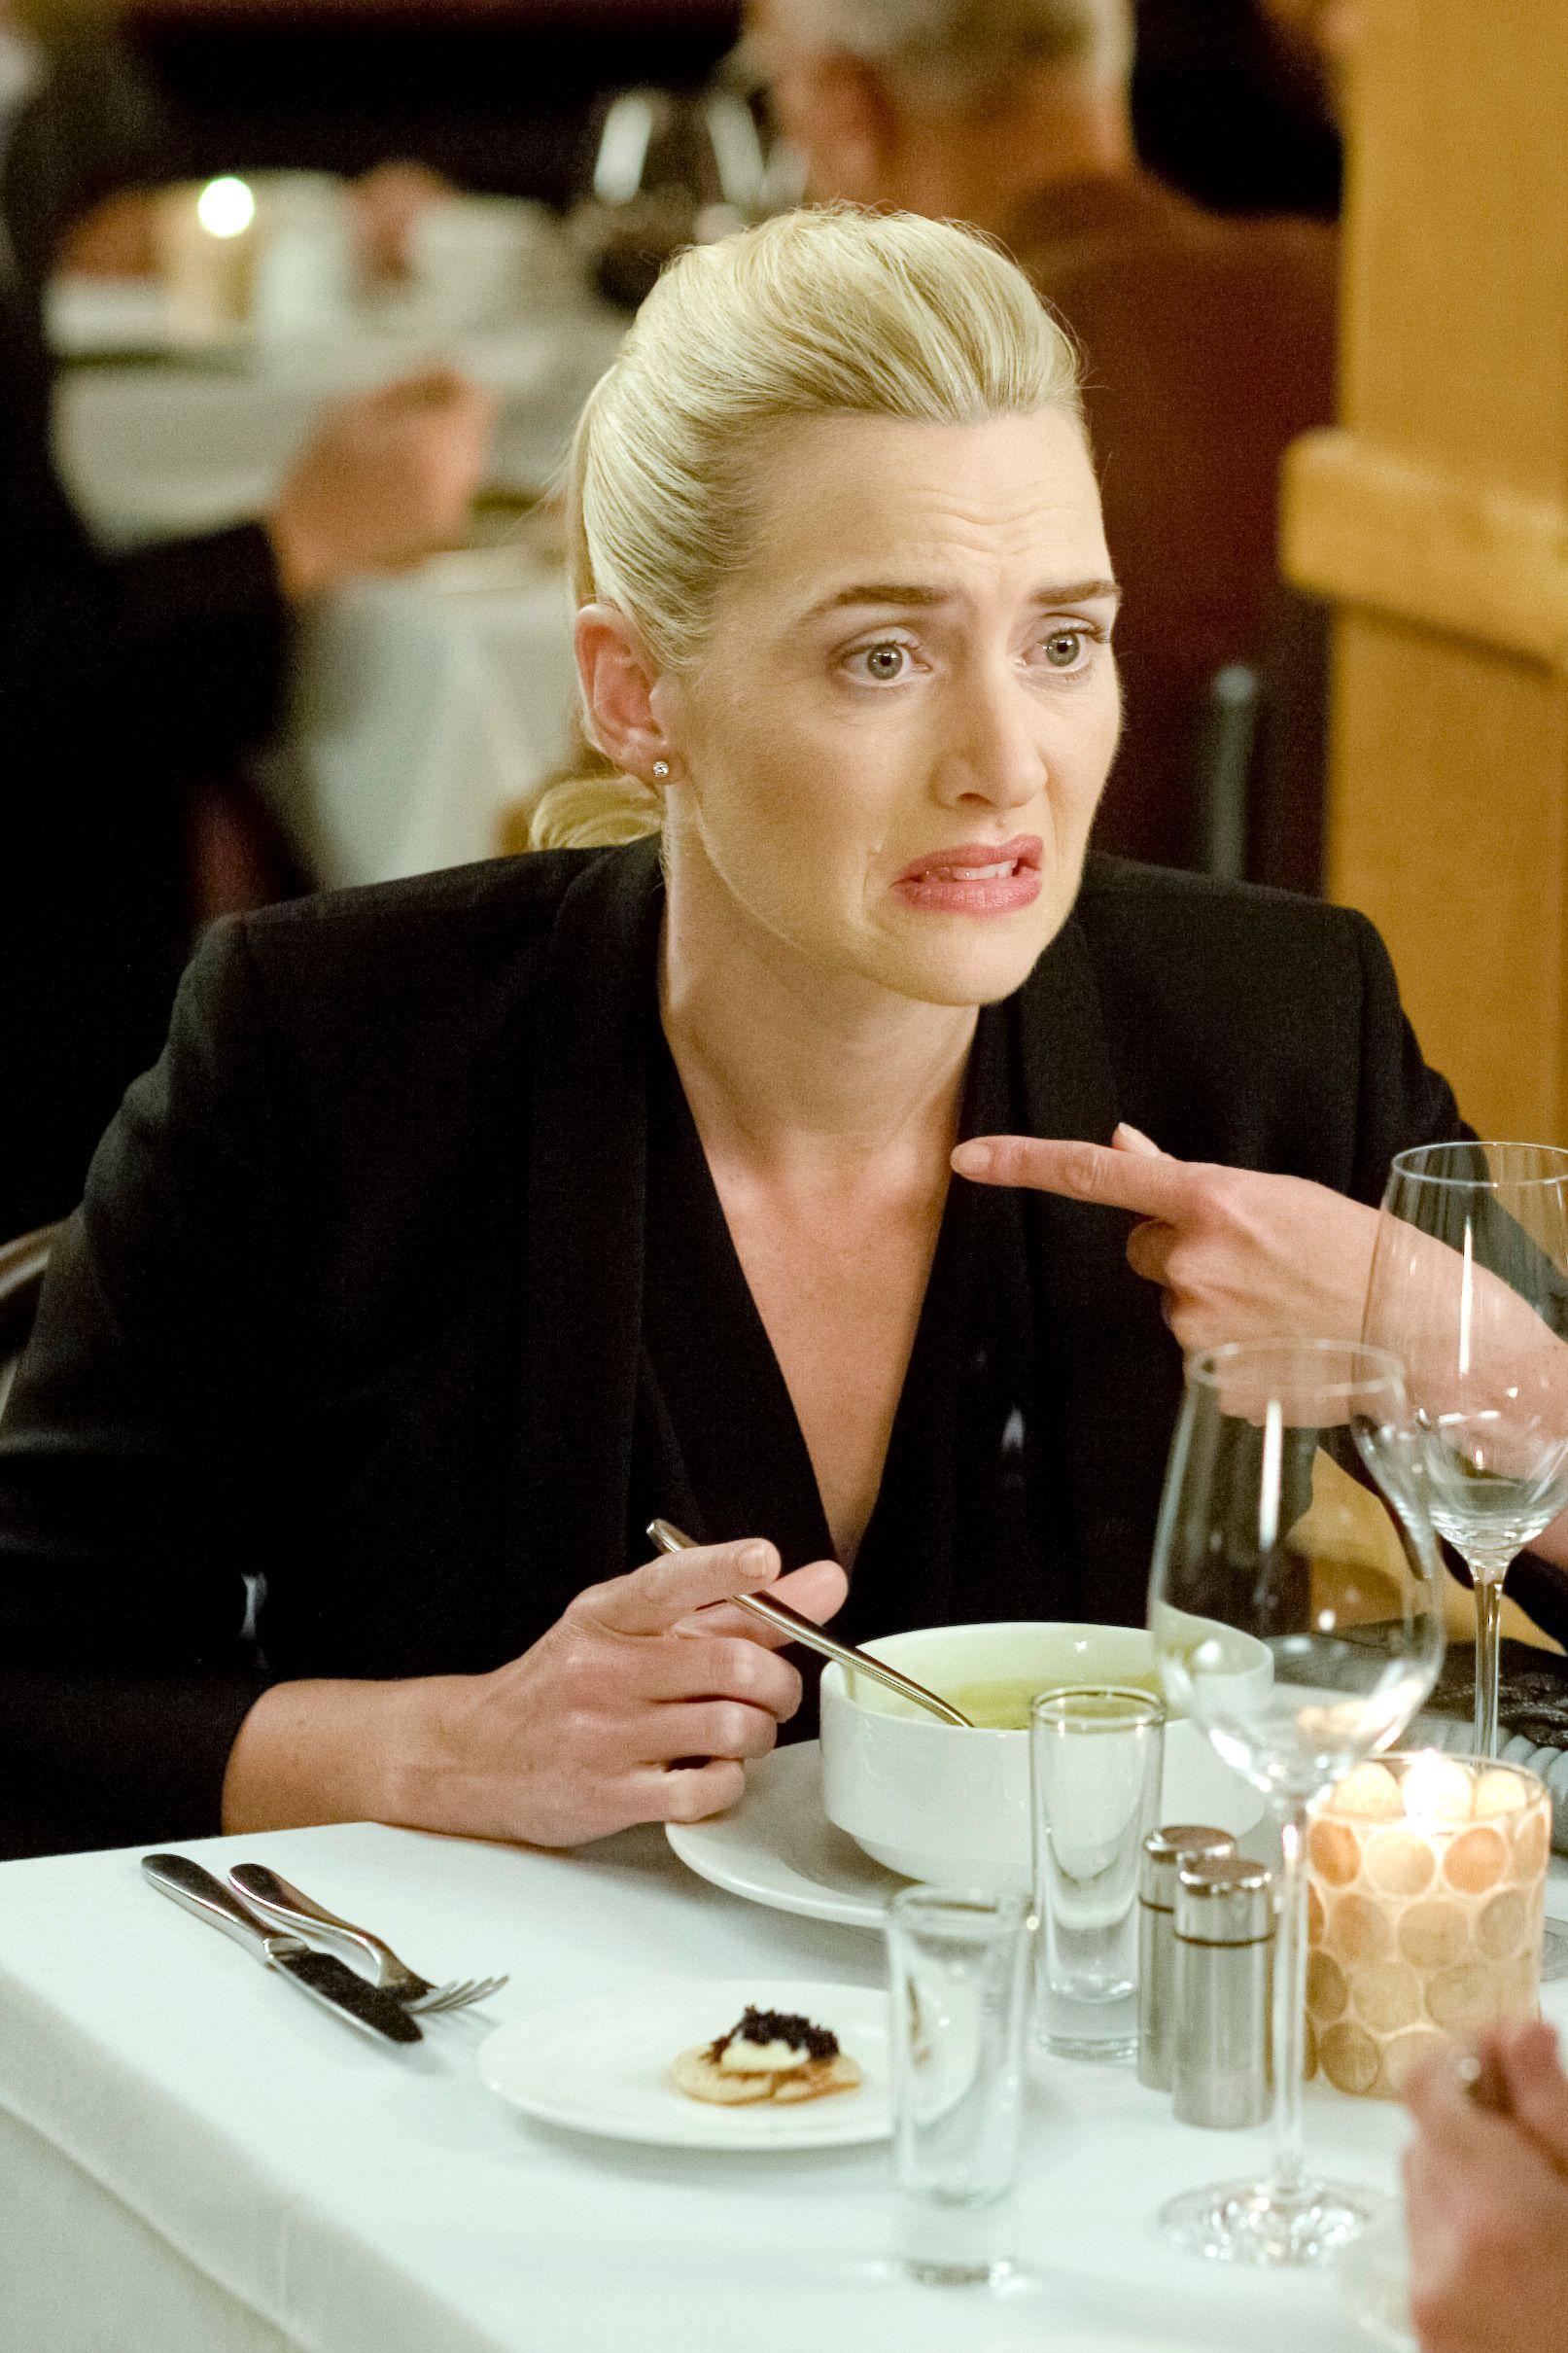 Kate Winslet Movies MOVIE 43 Images Starri...